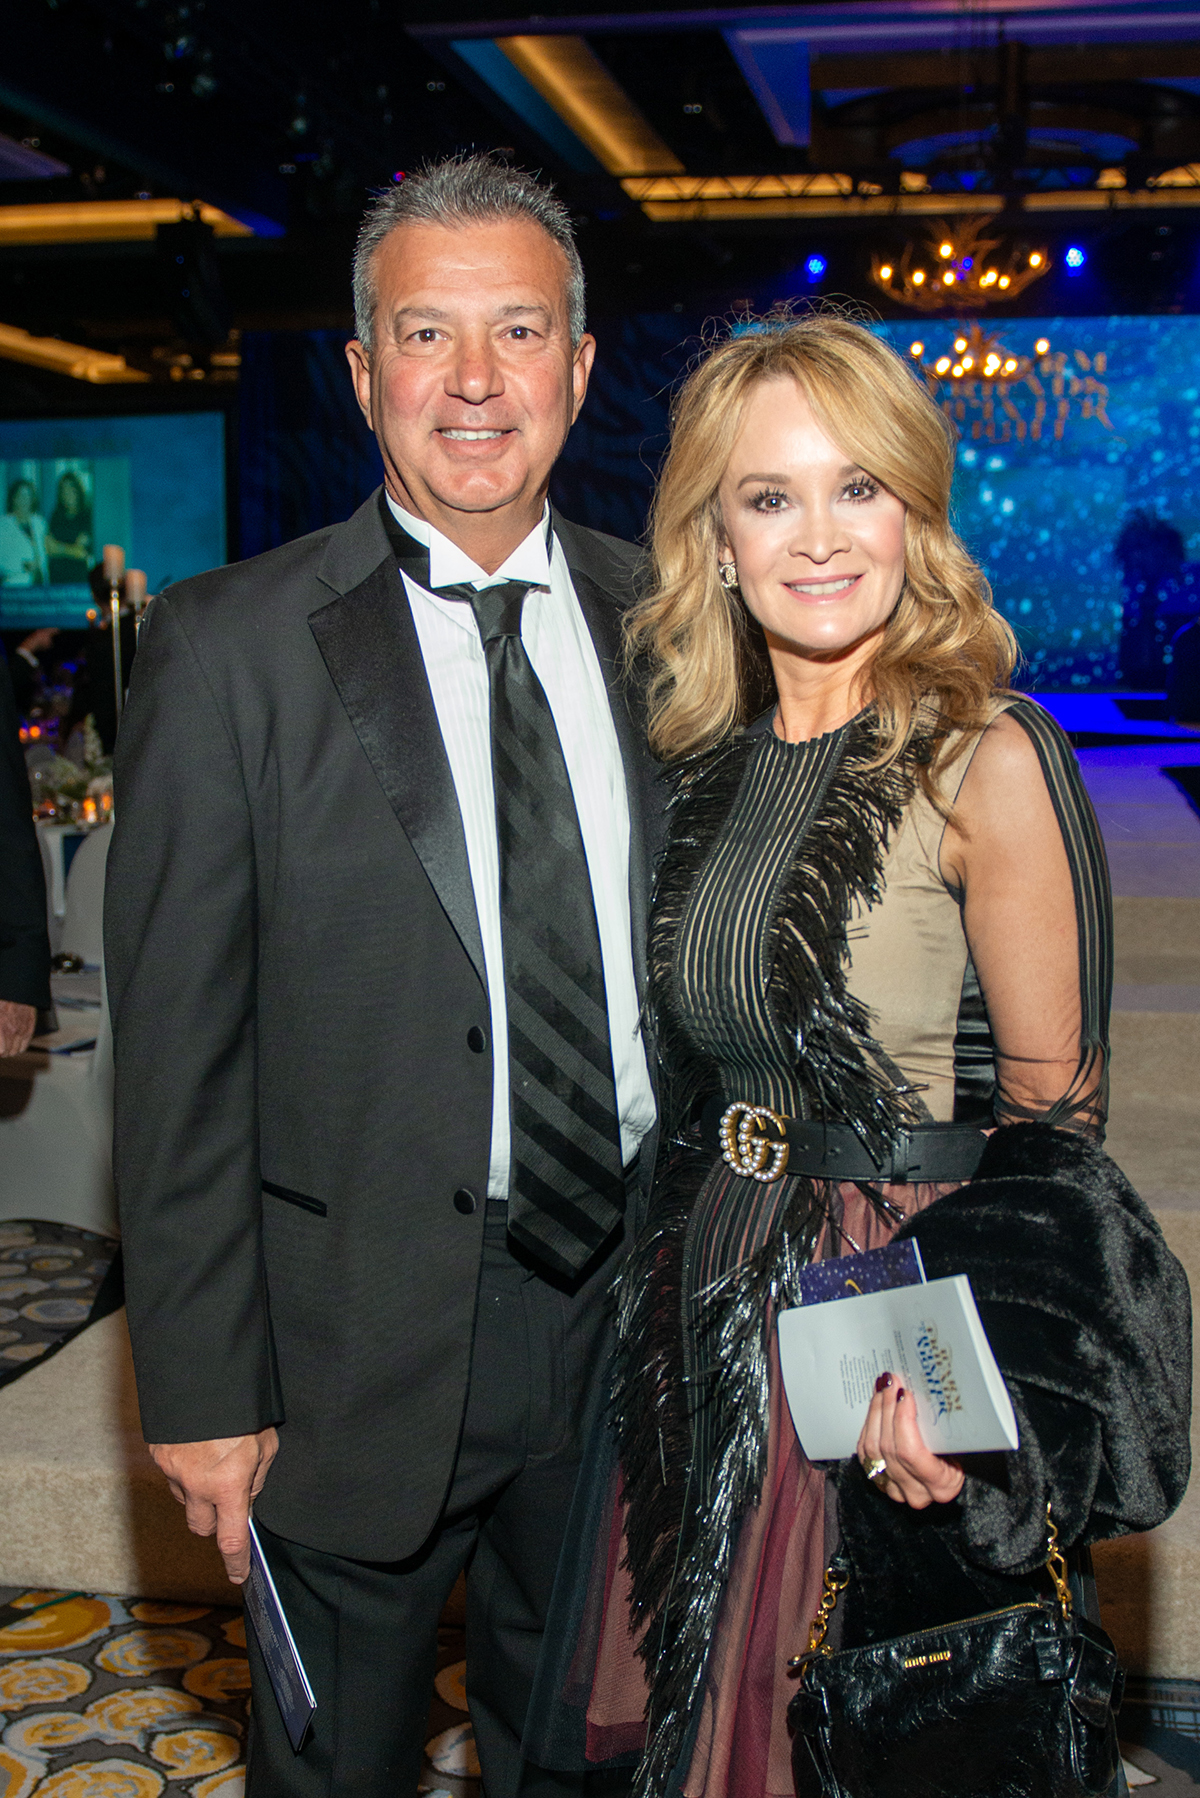 John and Wendy Granato